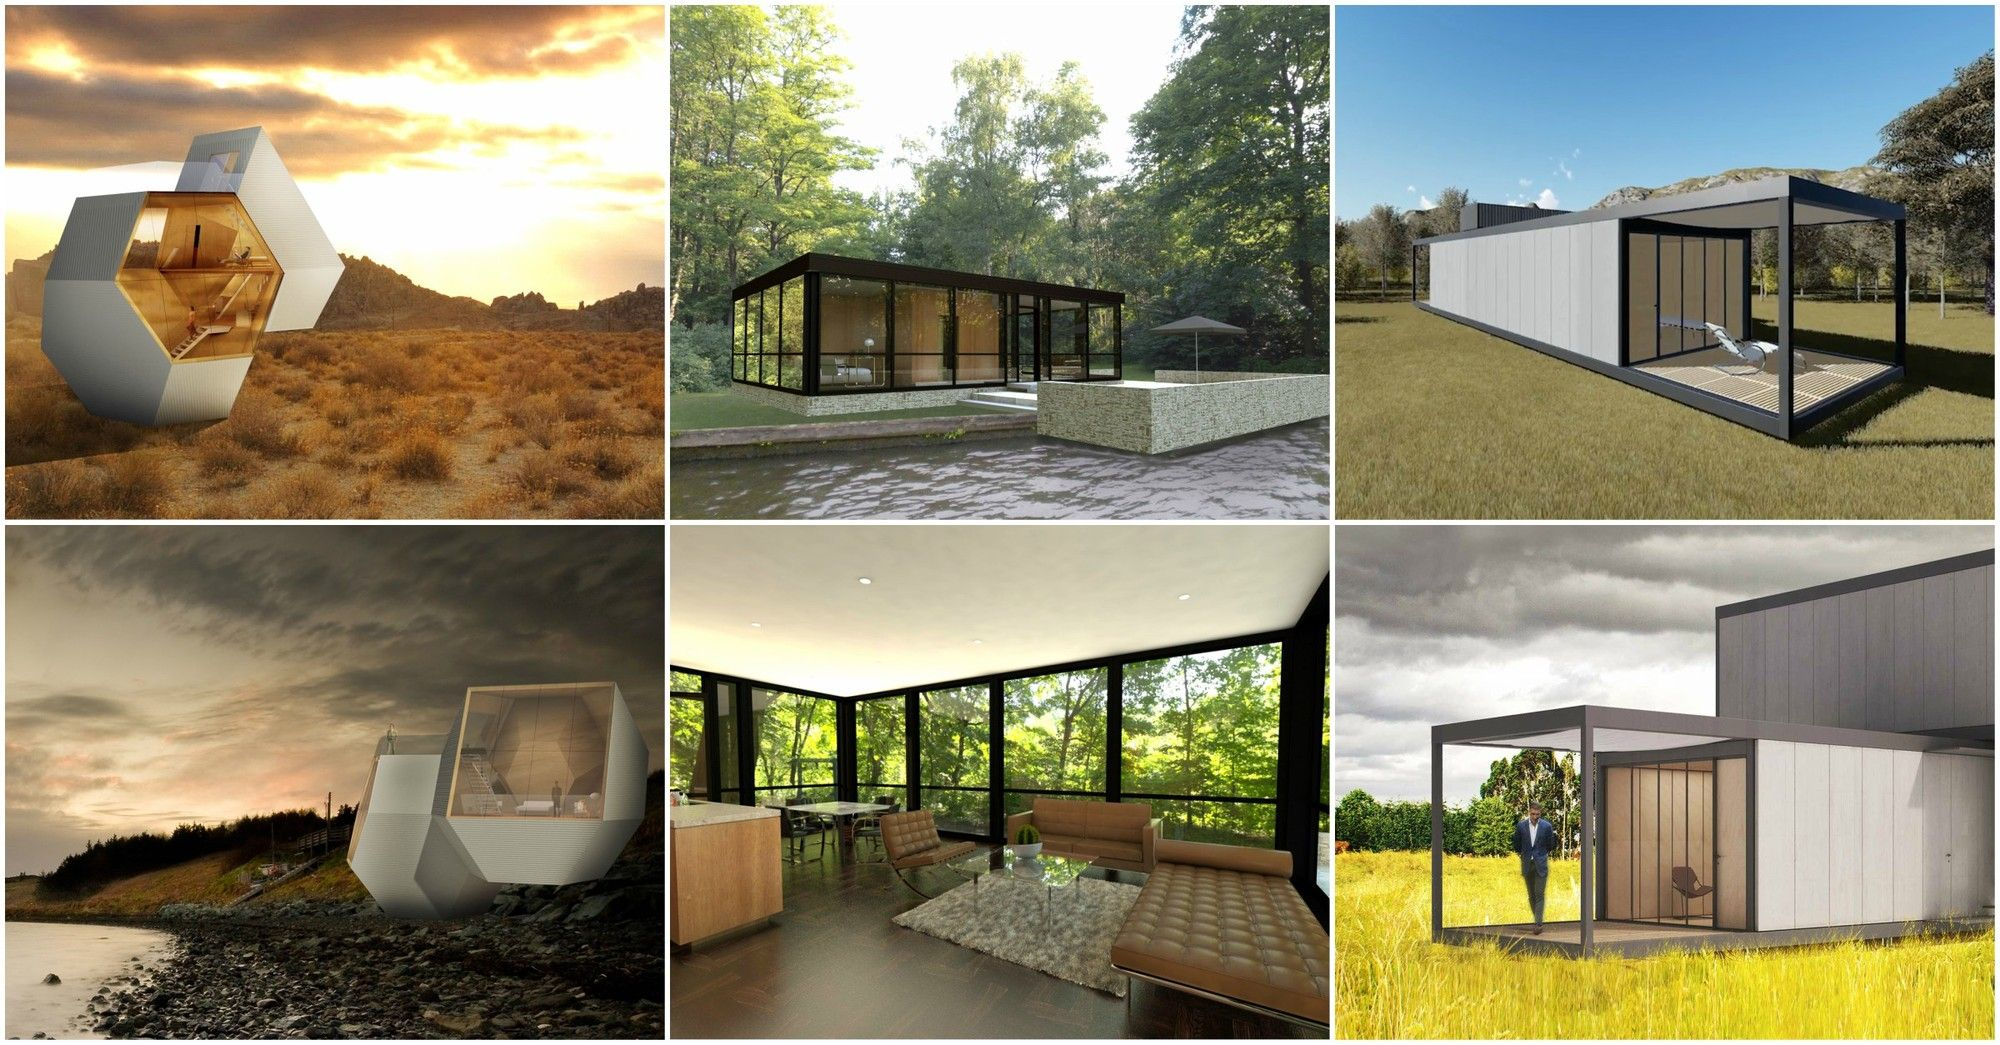 mendes da rocha fuksas pjar architects design pre fab. Black Bedroom Furniture Sets. Home Design Ideas